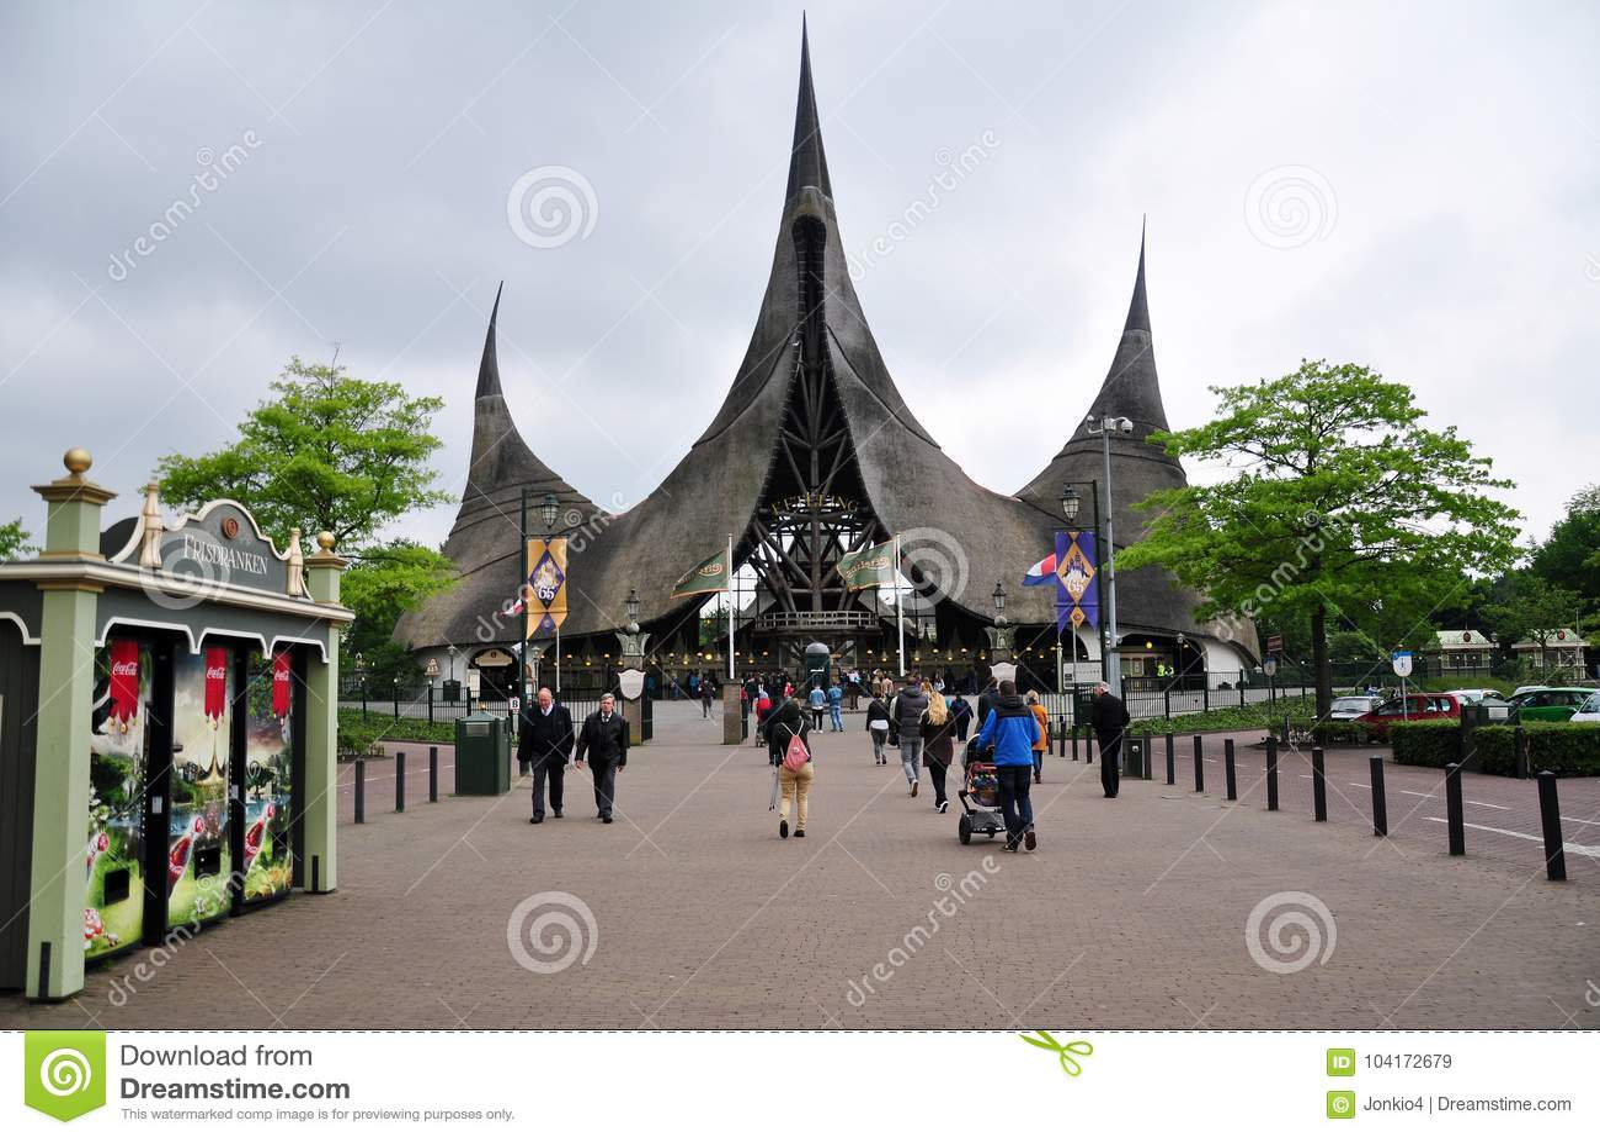 Ingang van Efteling, themapark, Nederland